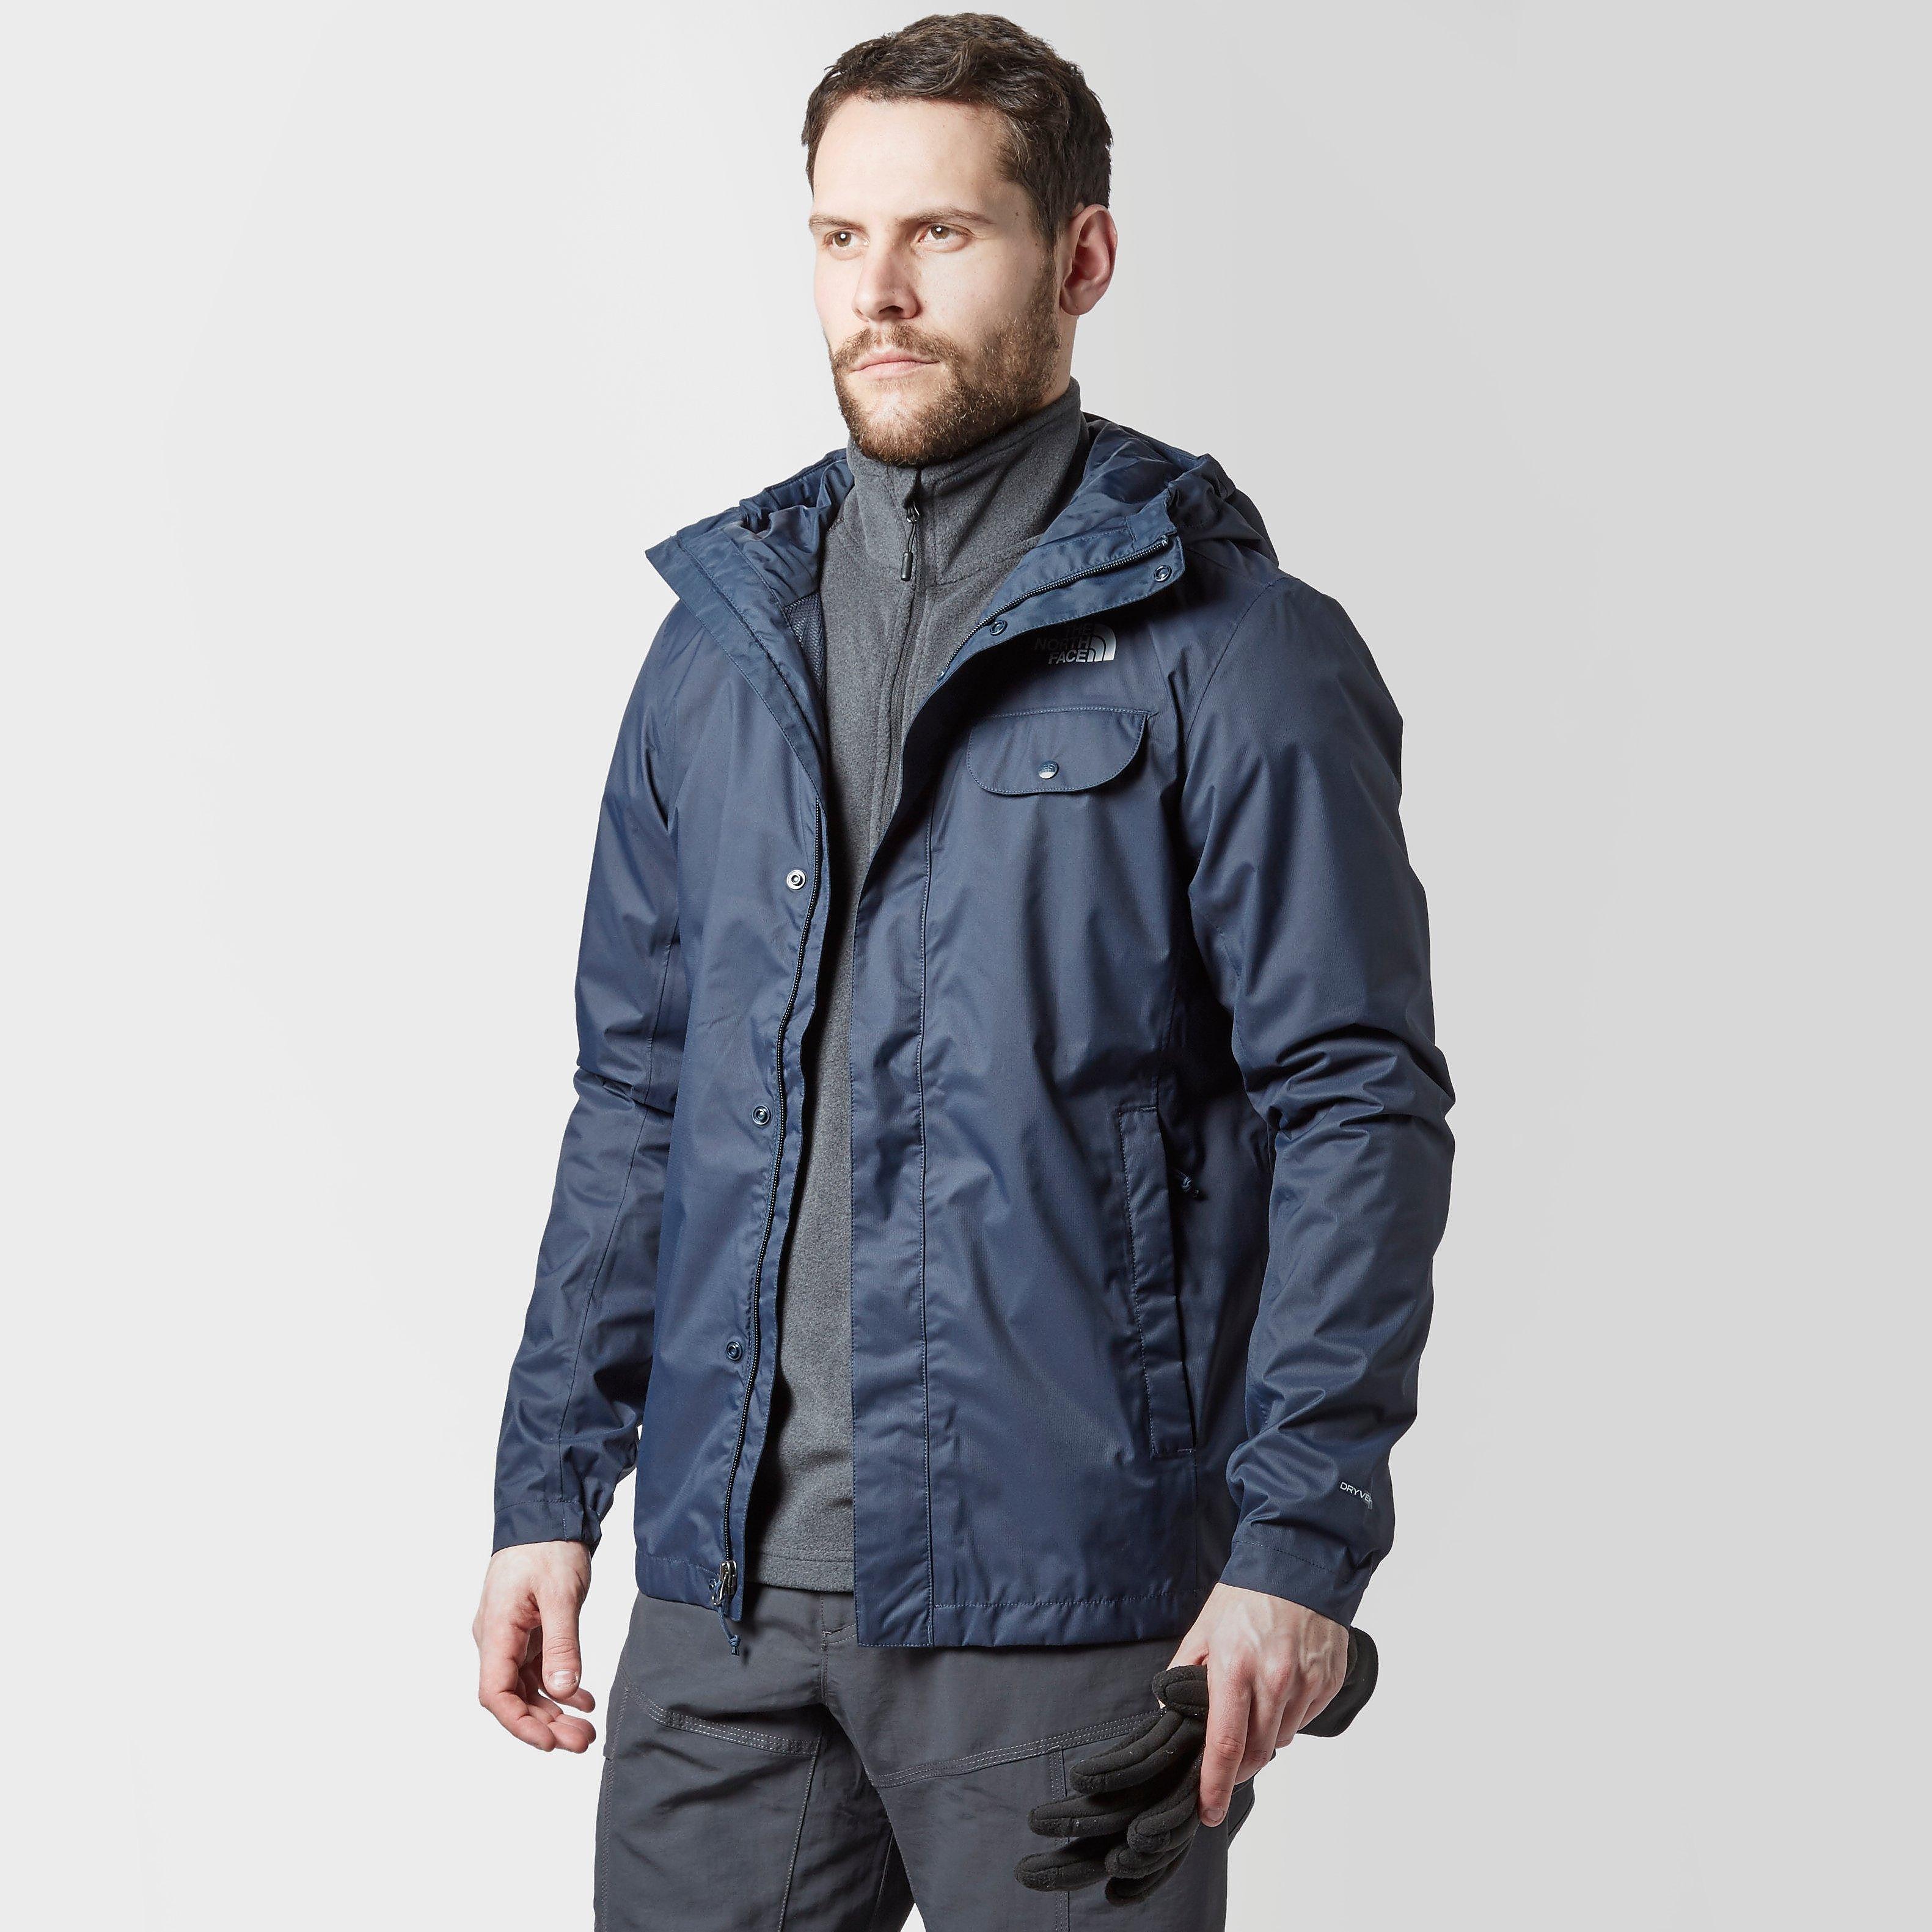 The North Face Tanken DryVent Men's Jacket